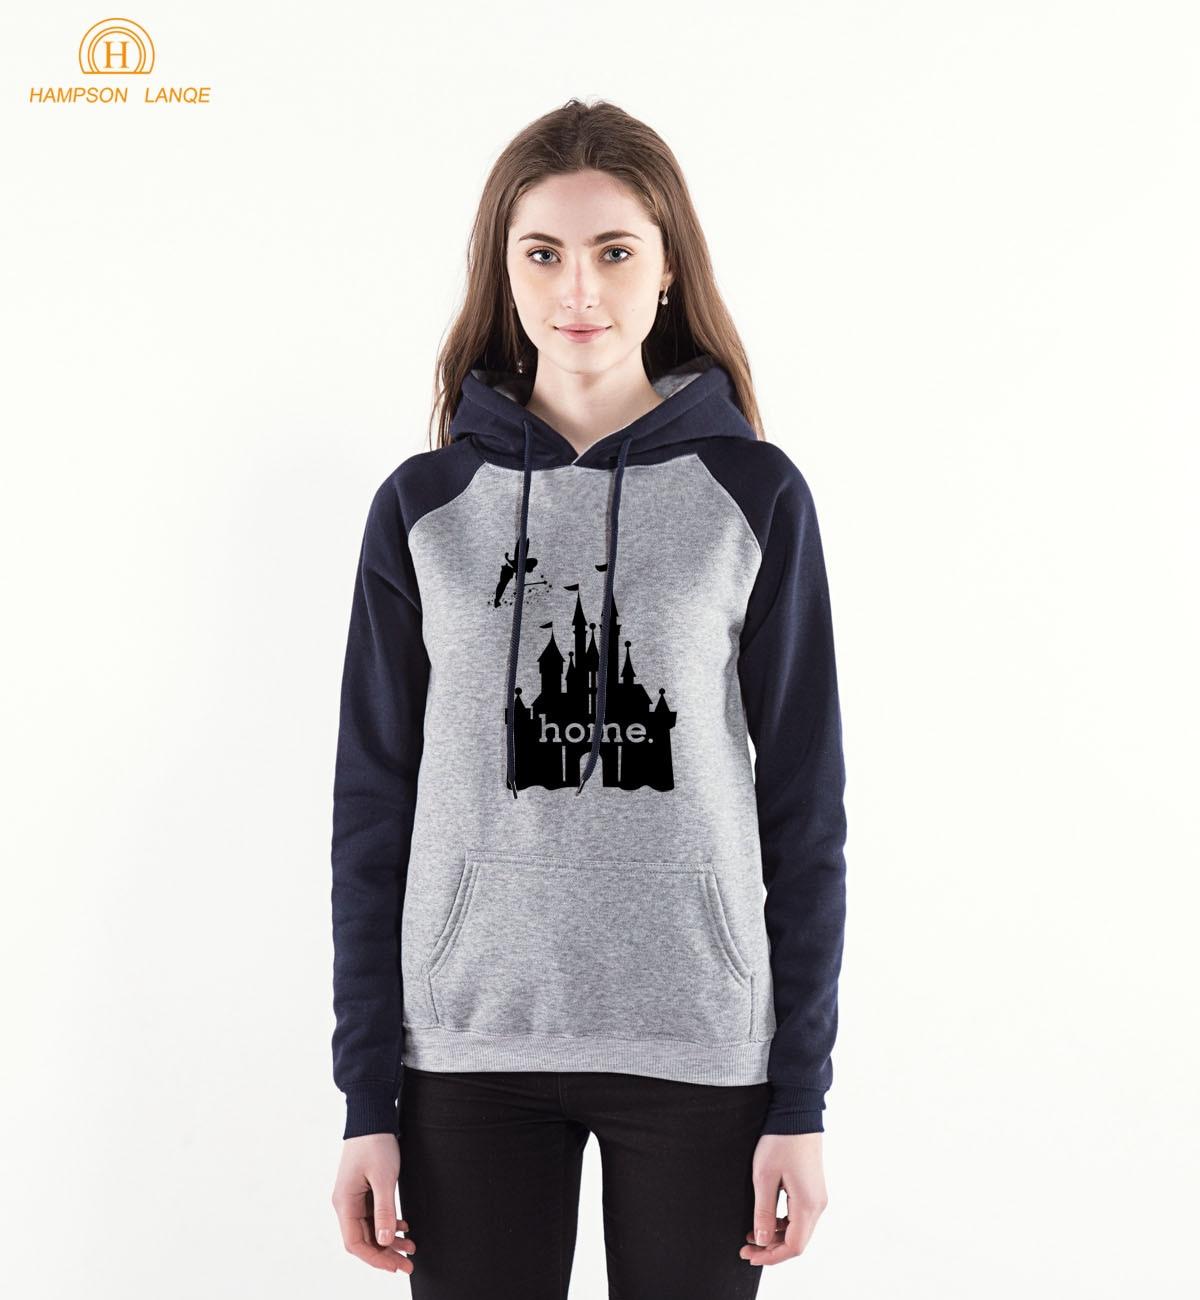 2018 Spring Autumn Women Pullovers Home House Castle Print Casual Hoodies Sweatshirts Long Sleeve Raglan Hoodie For Adult S-XXL